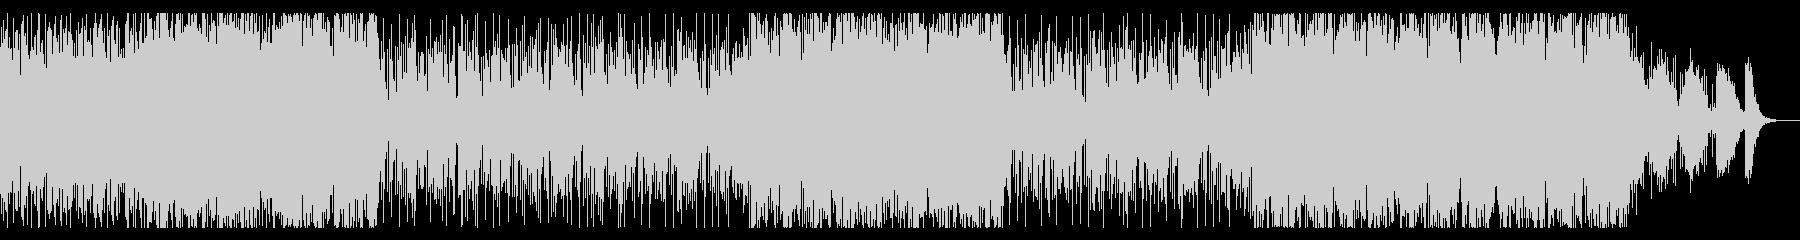 Wave,EDMの曲の未再生の波形